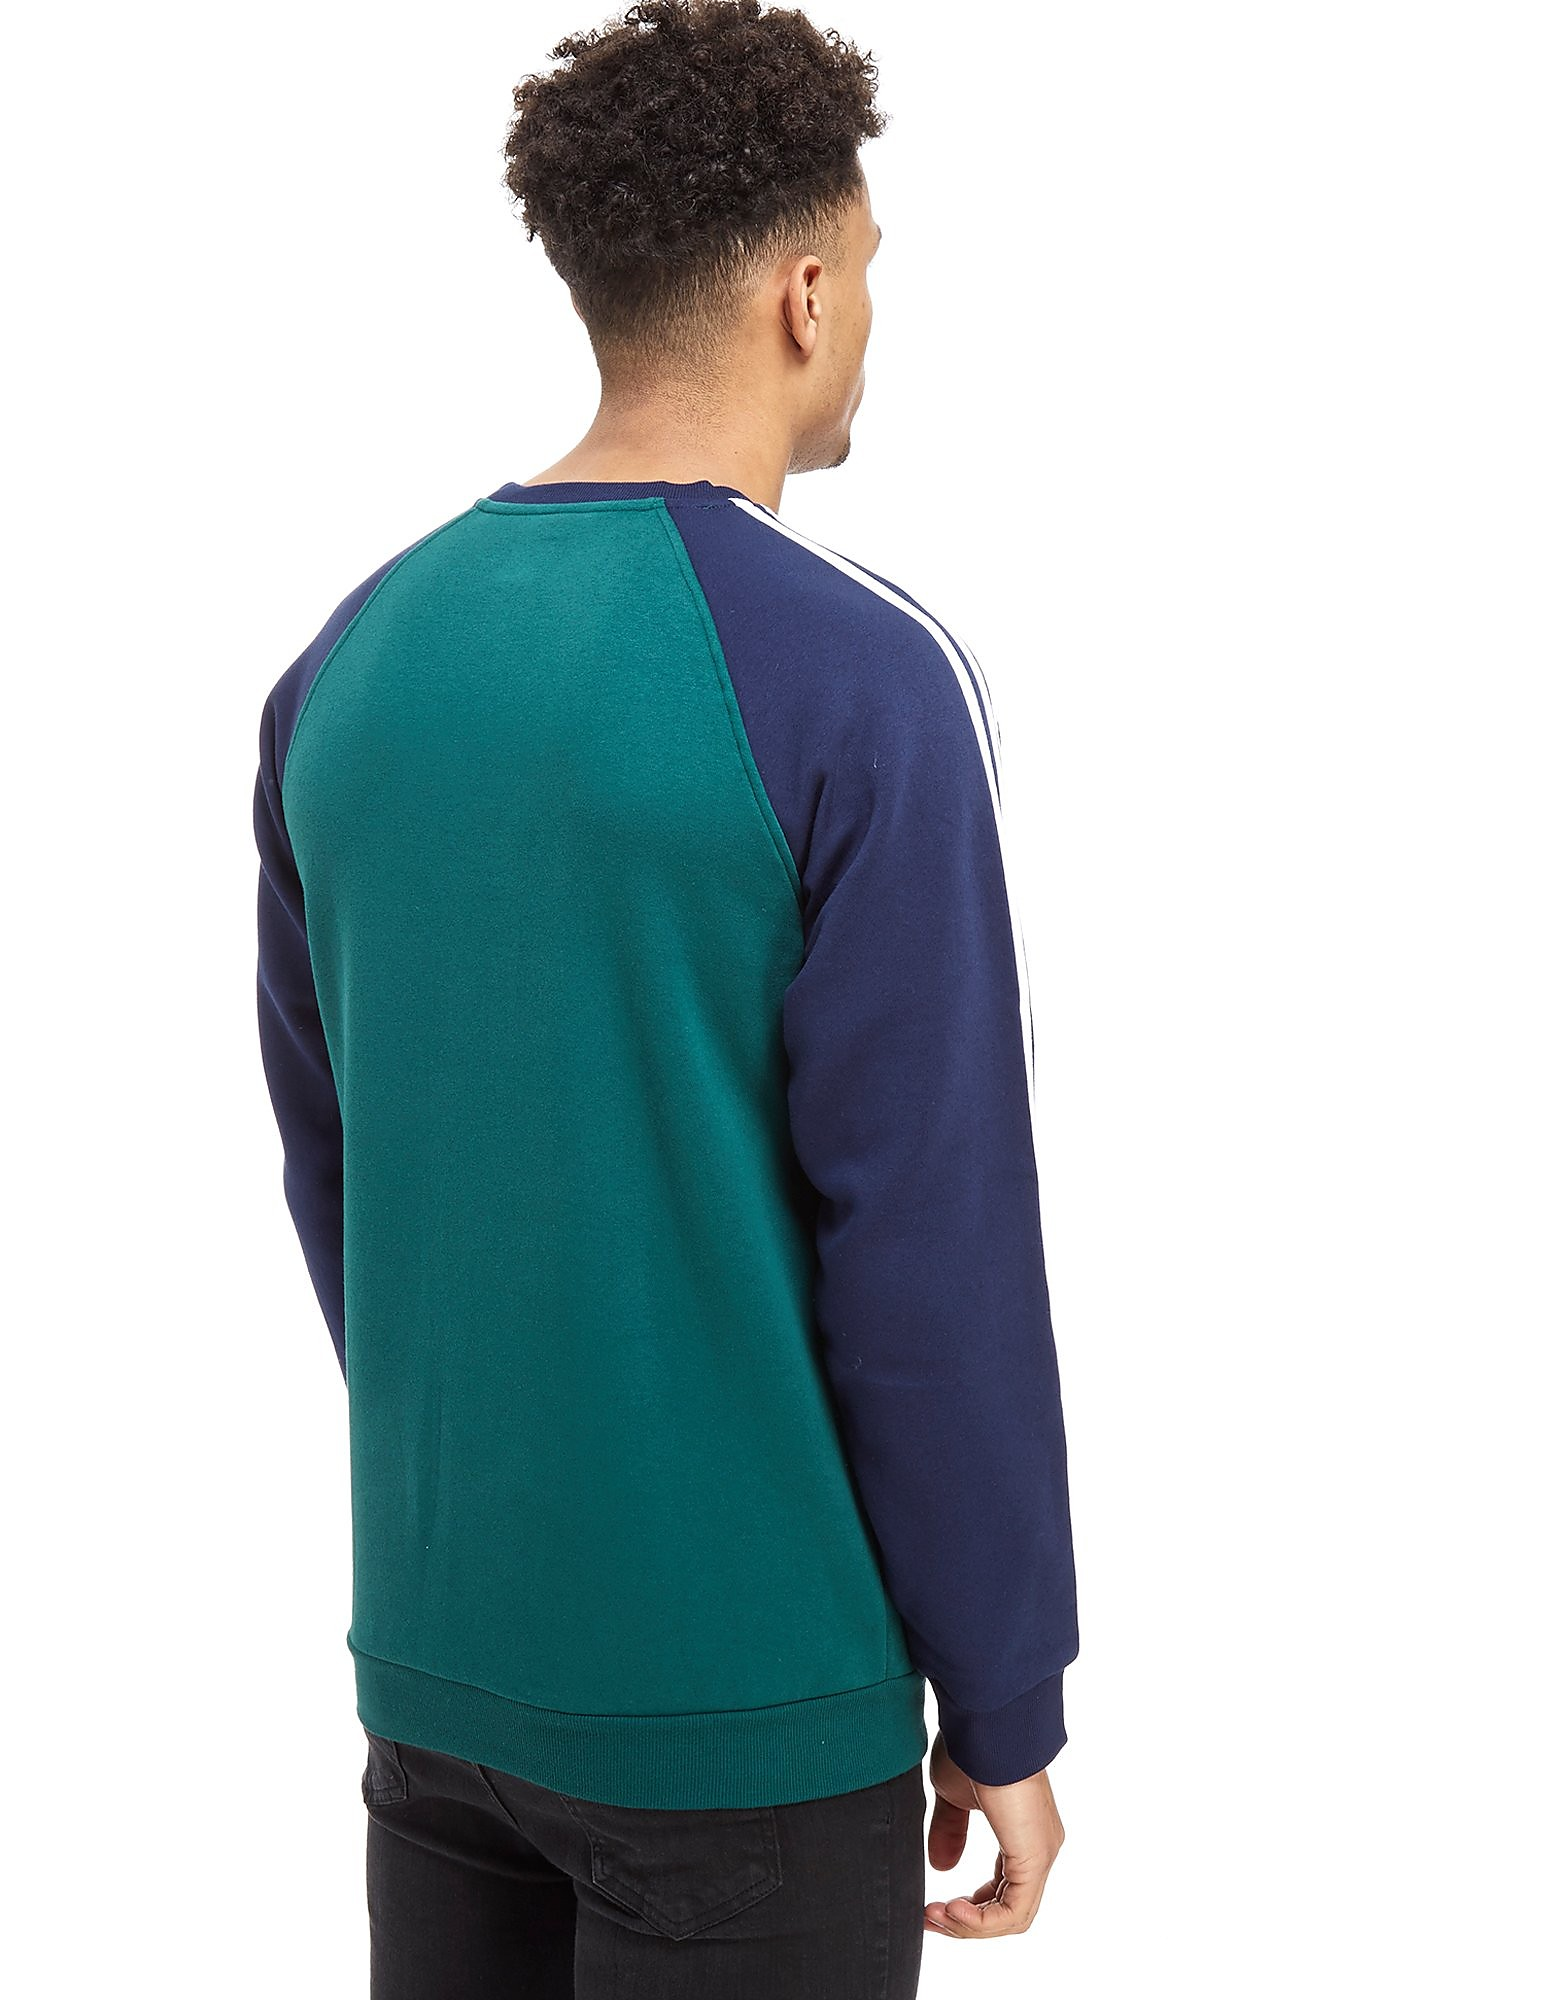 adidas Originals Skateboarding Raglan Crew Sweatshirt